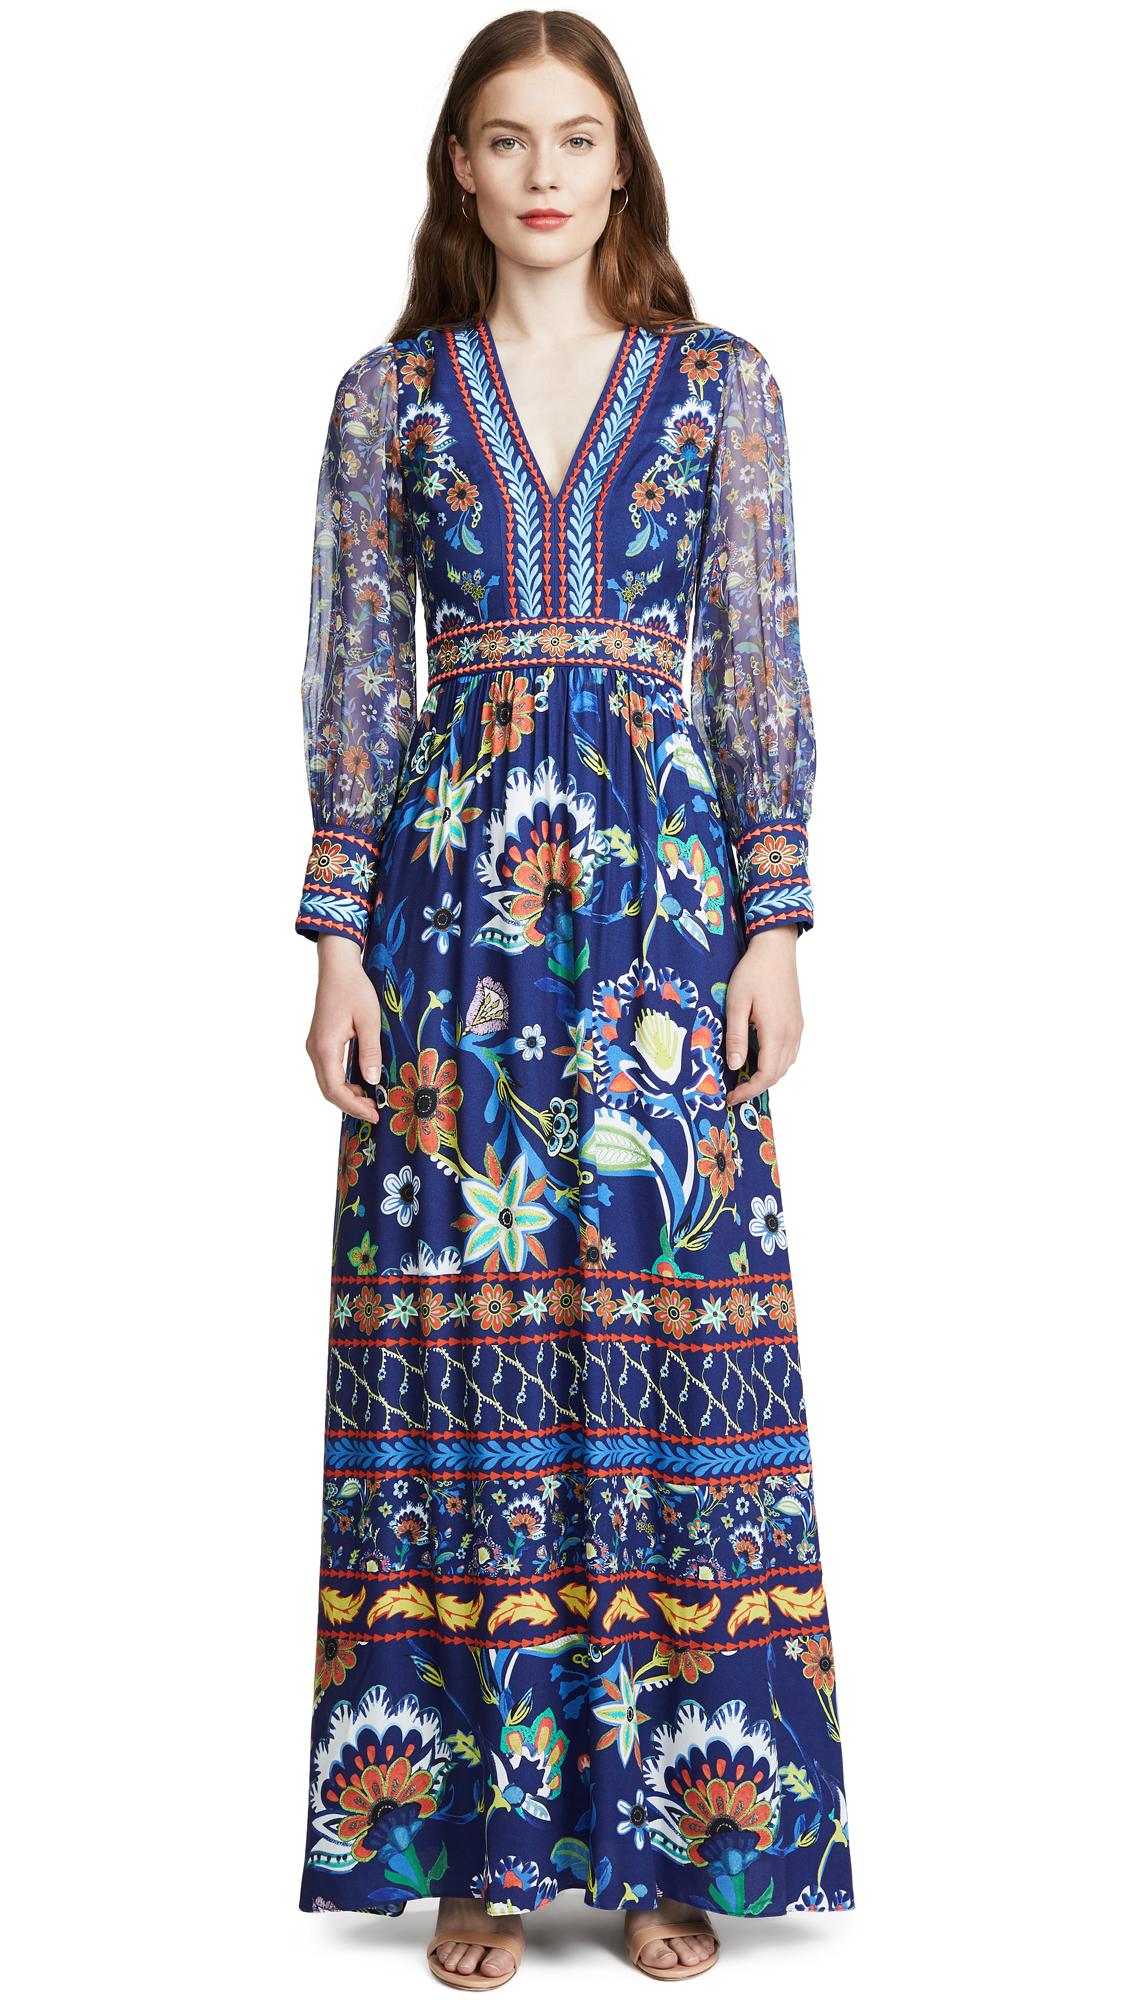 alice + olivia Jada Maxi Dress